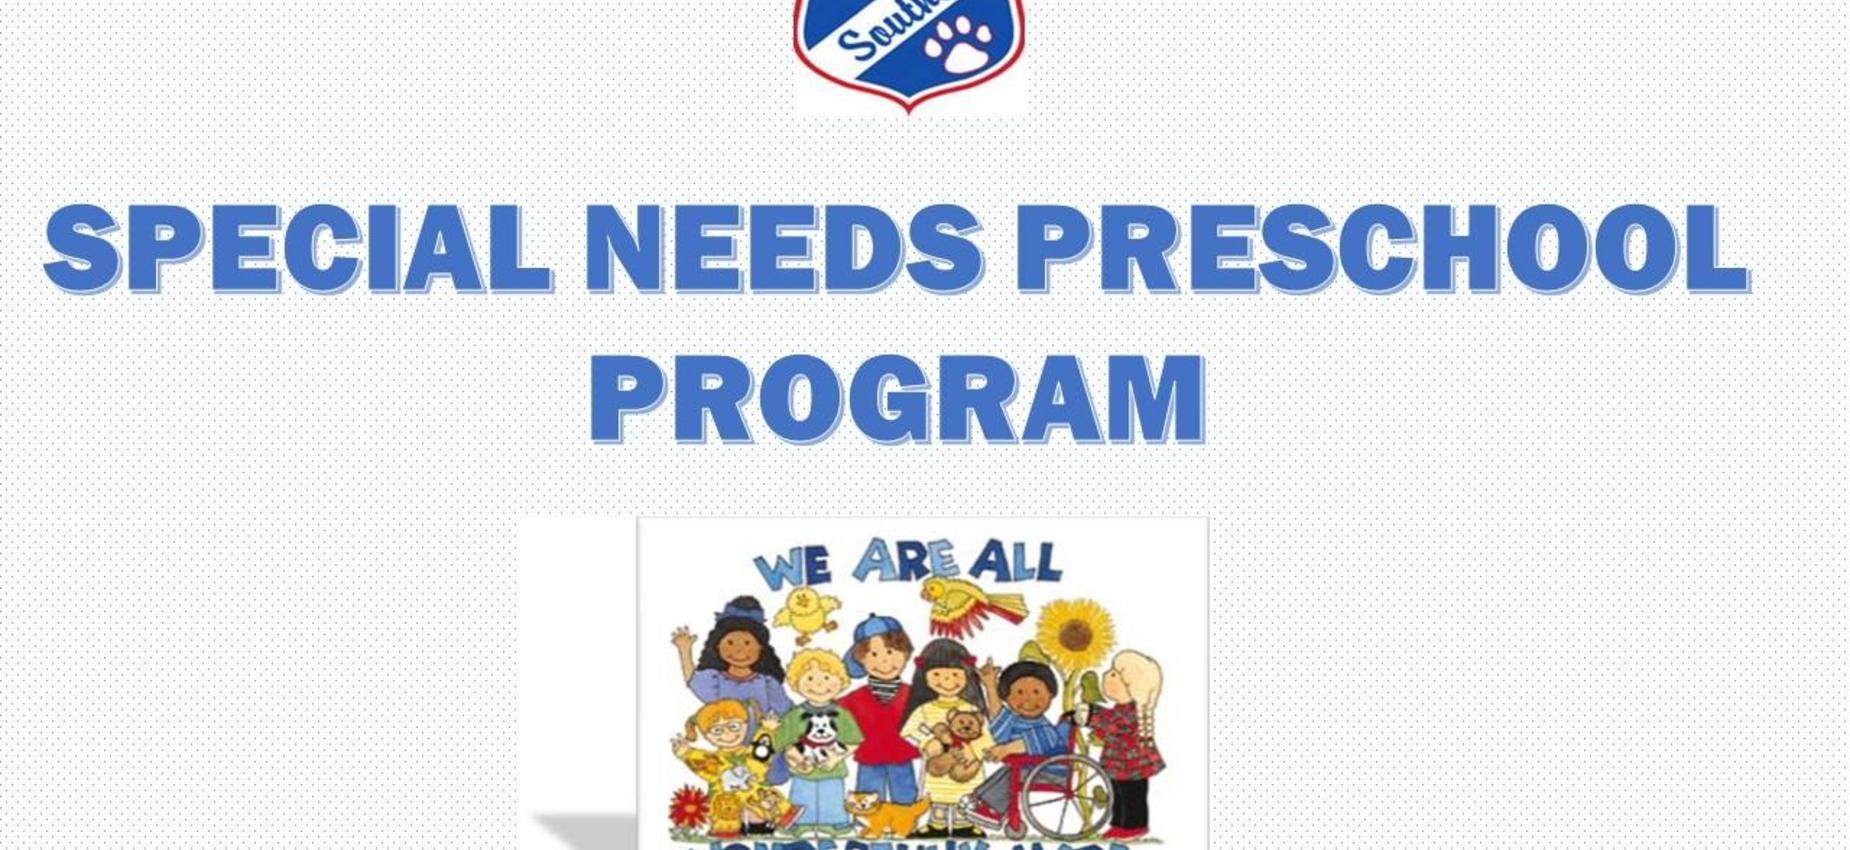 SEE Special Needs Preschool Graphic